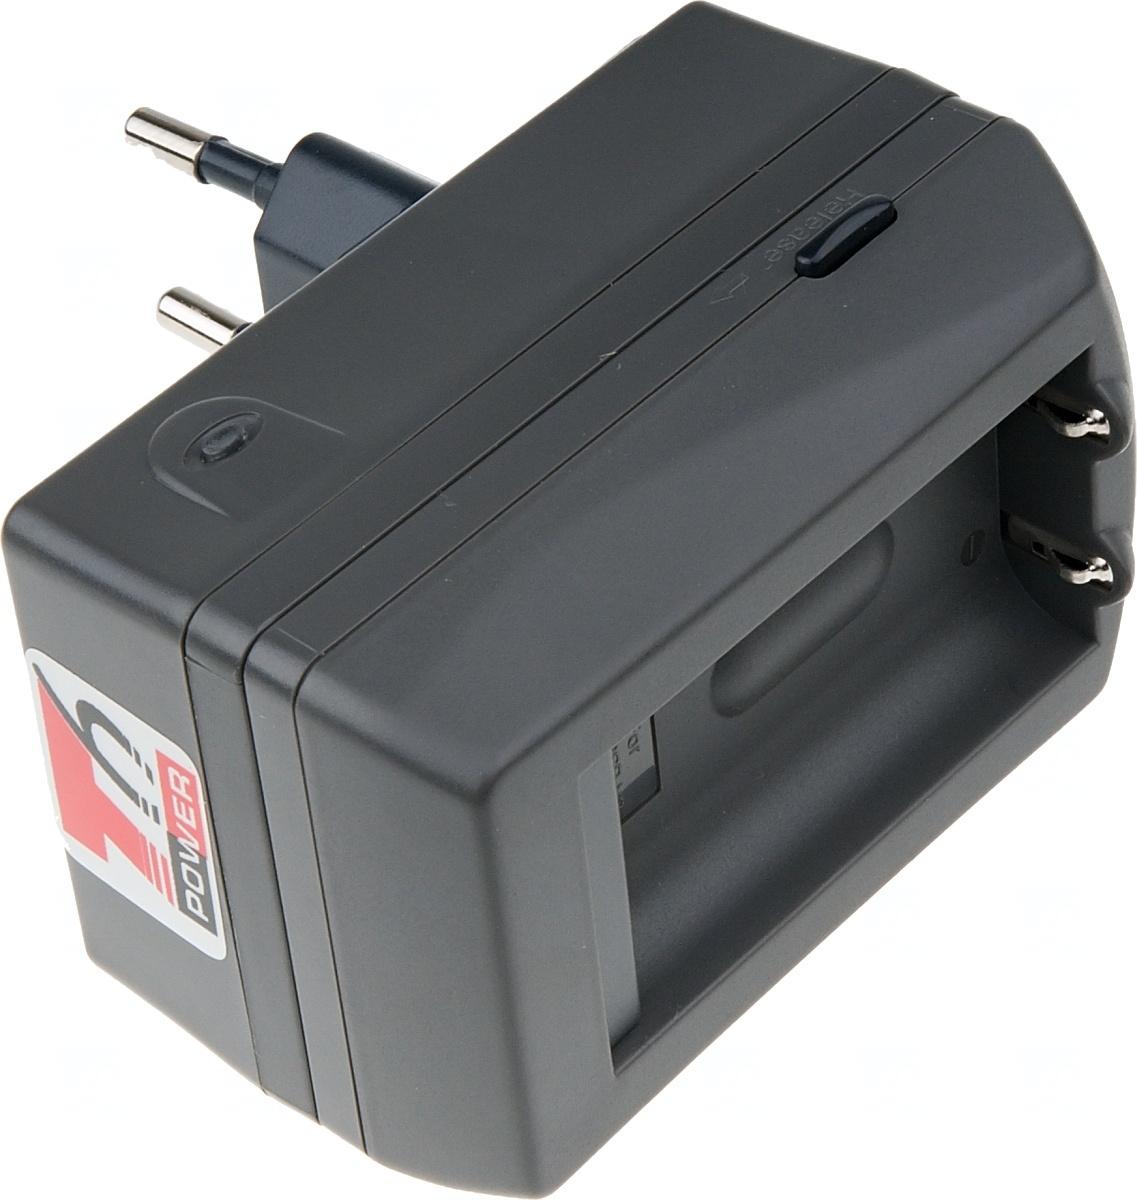 Nabíječka T6 power Nikon EN-EL23, 230V, 0,5A